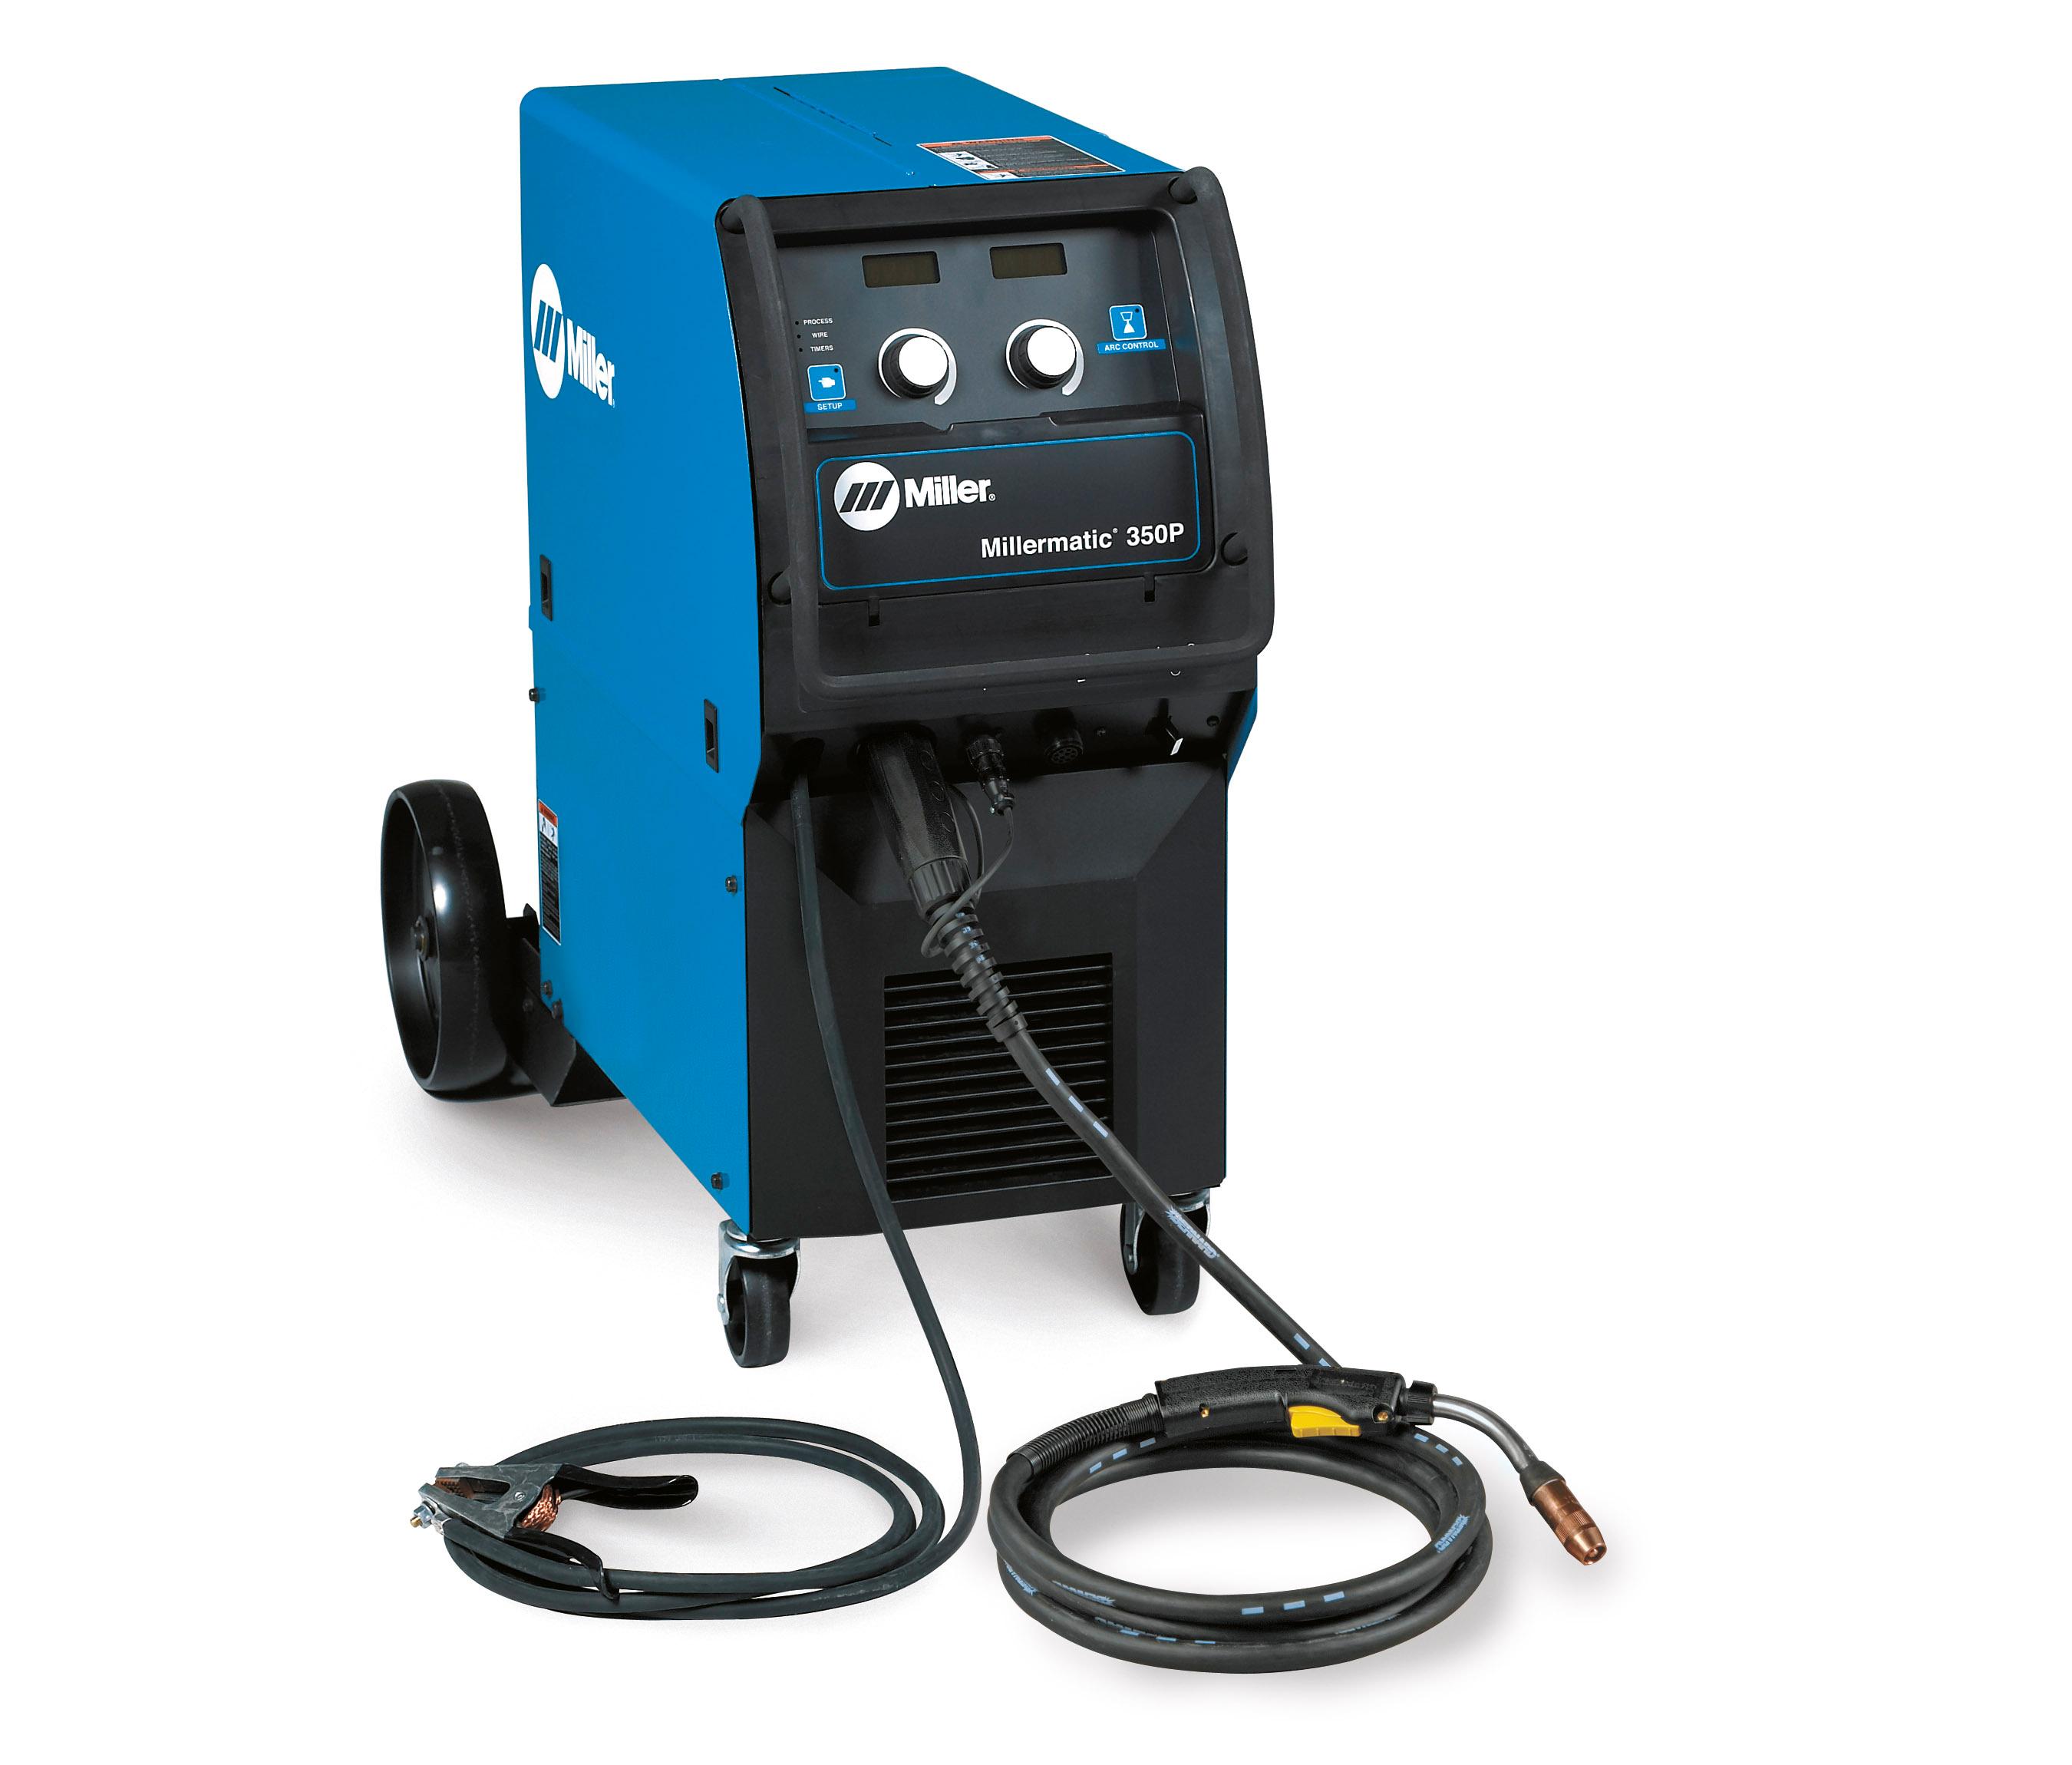 Millermatic 350P-1 Welding Machine